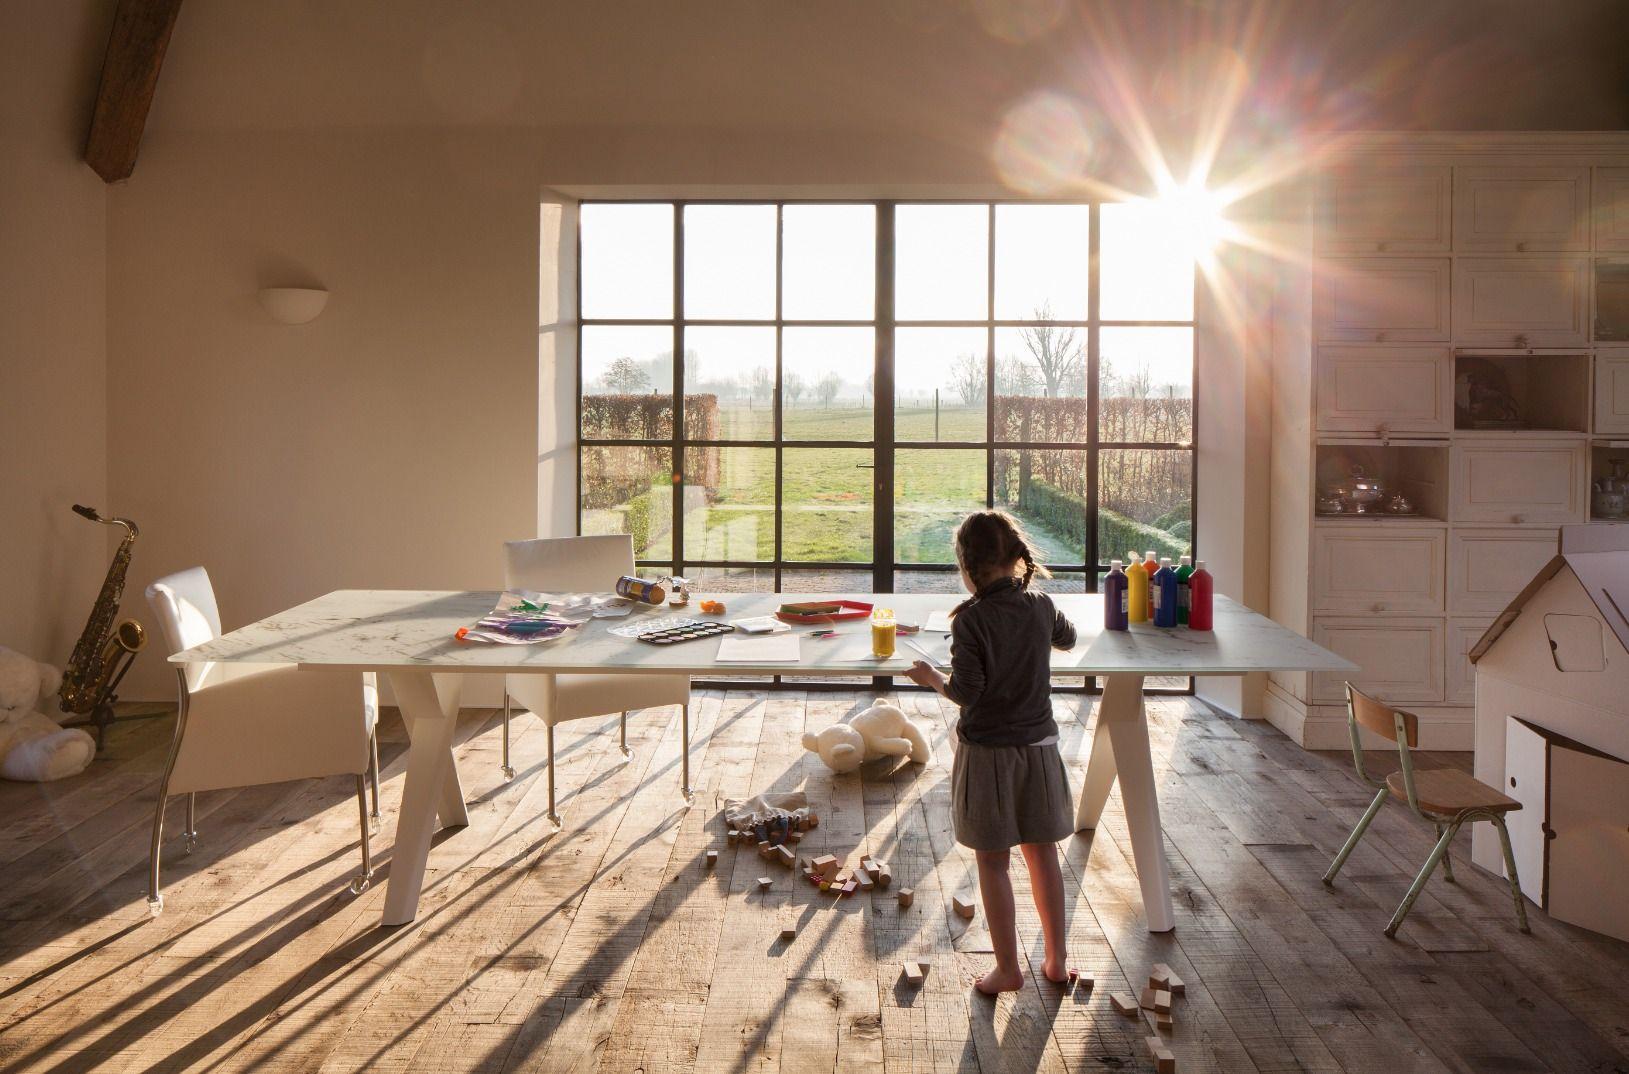 Emejing Top Interieur Izegem Stoelen Photos - Trend Ideas 2018 ...